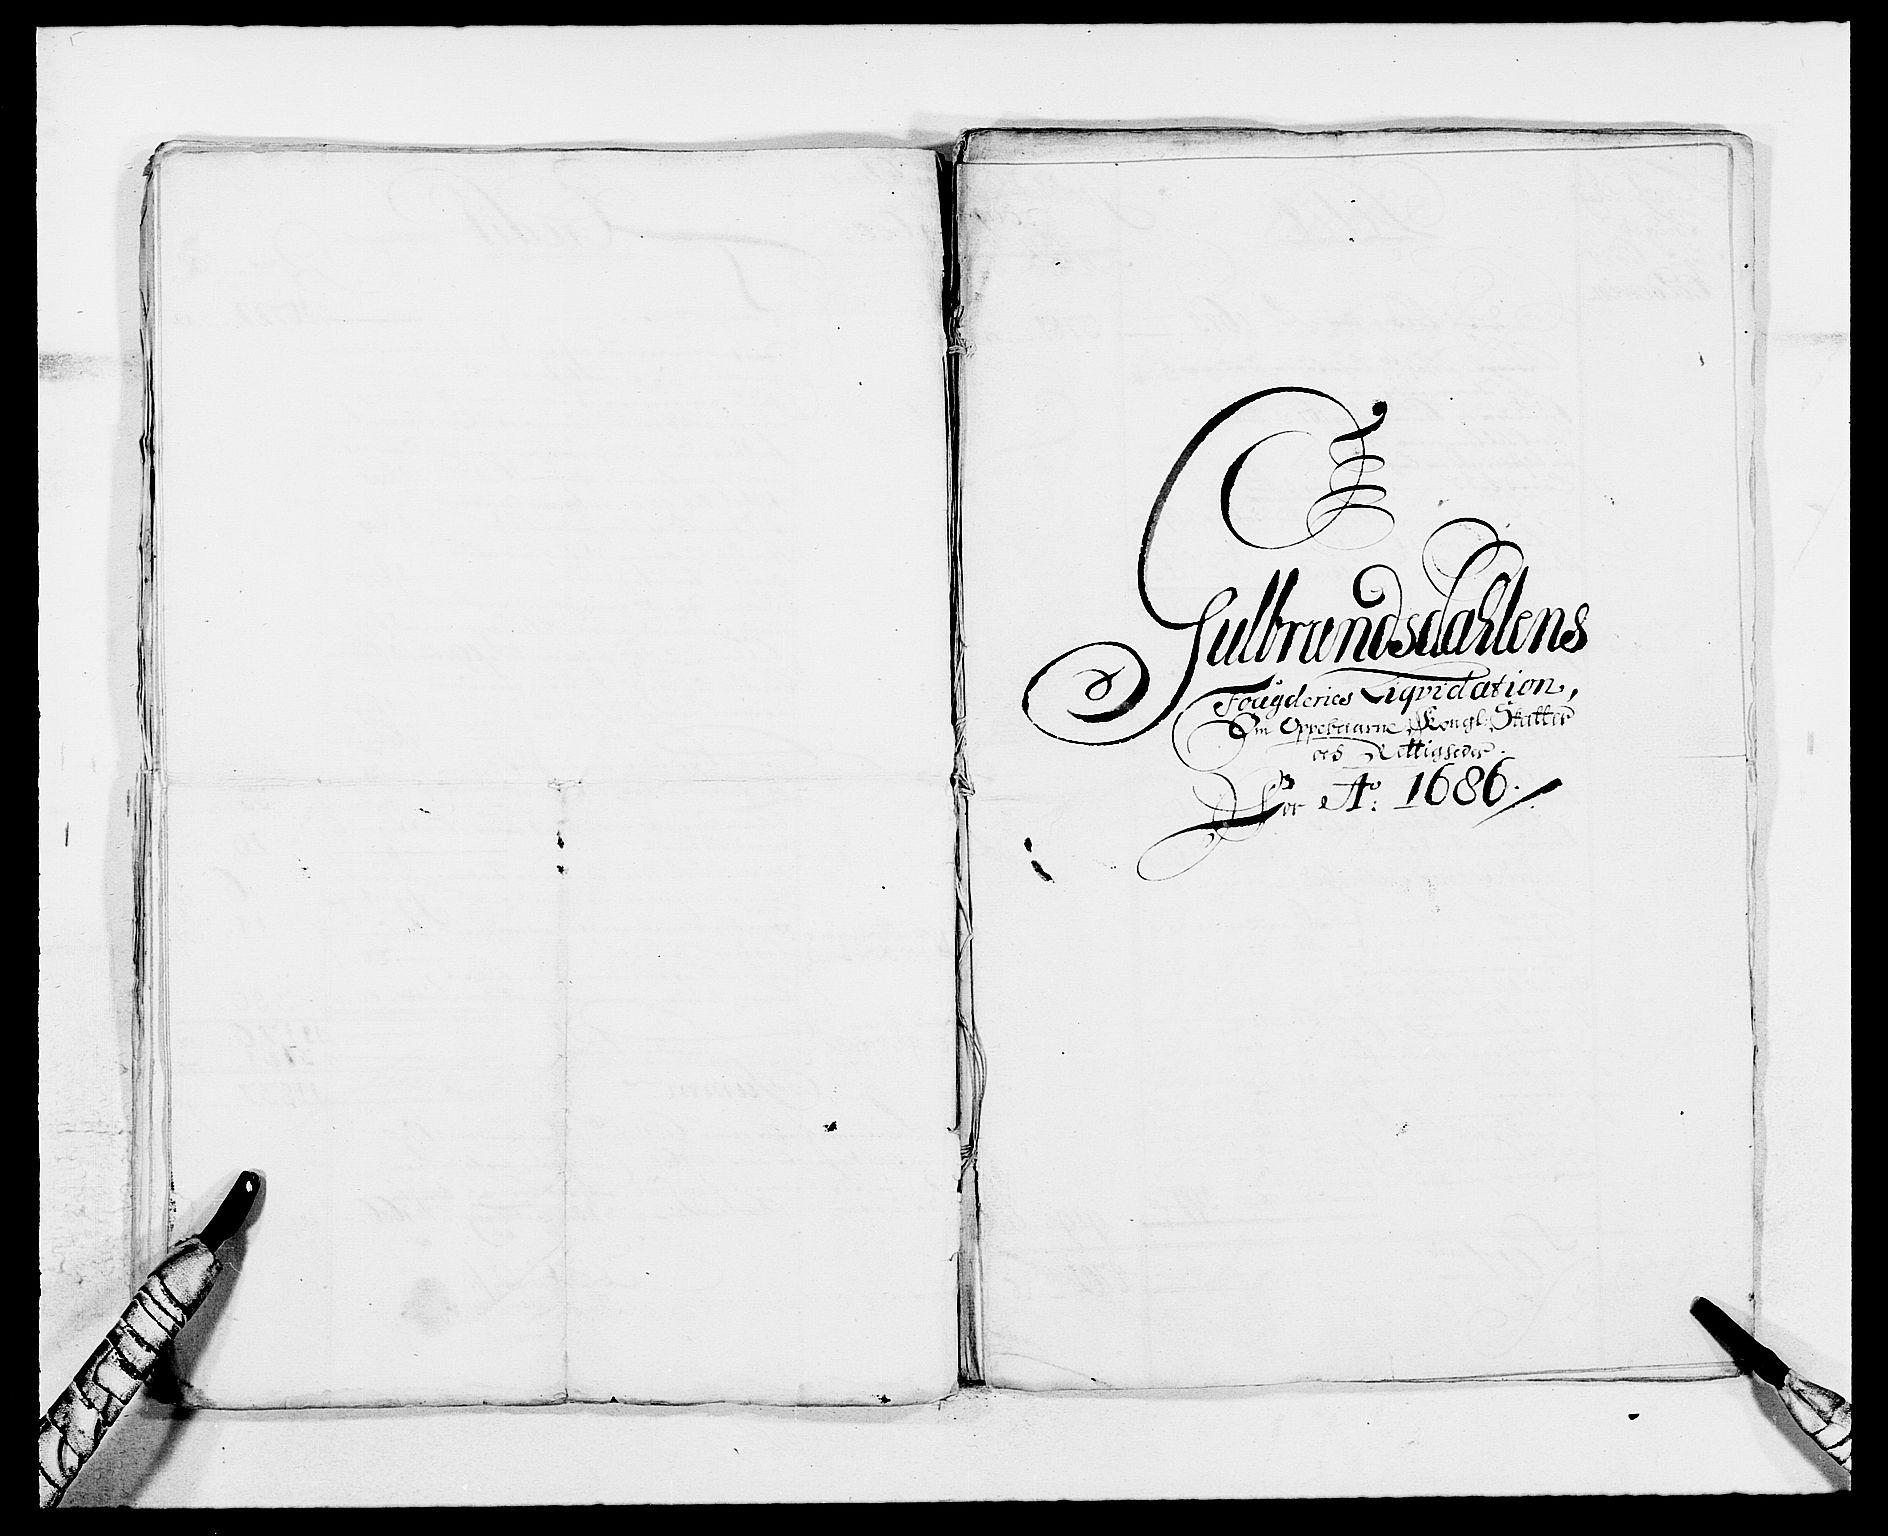 RA, Rentekammeret inntil 1814, Reviderte regnskaper, Fogderegnskap, R17/L1157: Fogderegnskap Gudbrandsdal, 1682-1689, s. 20